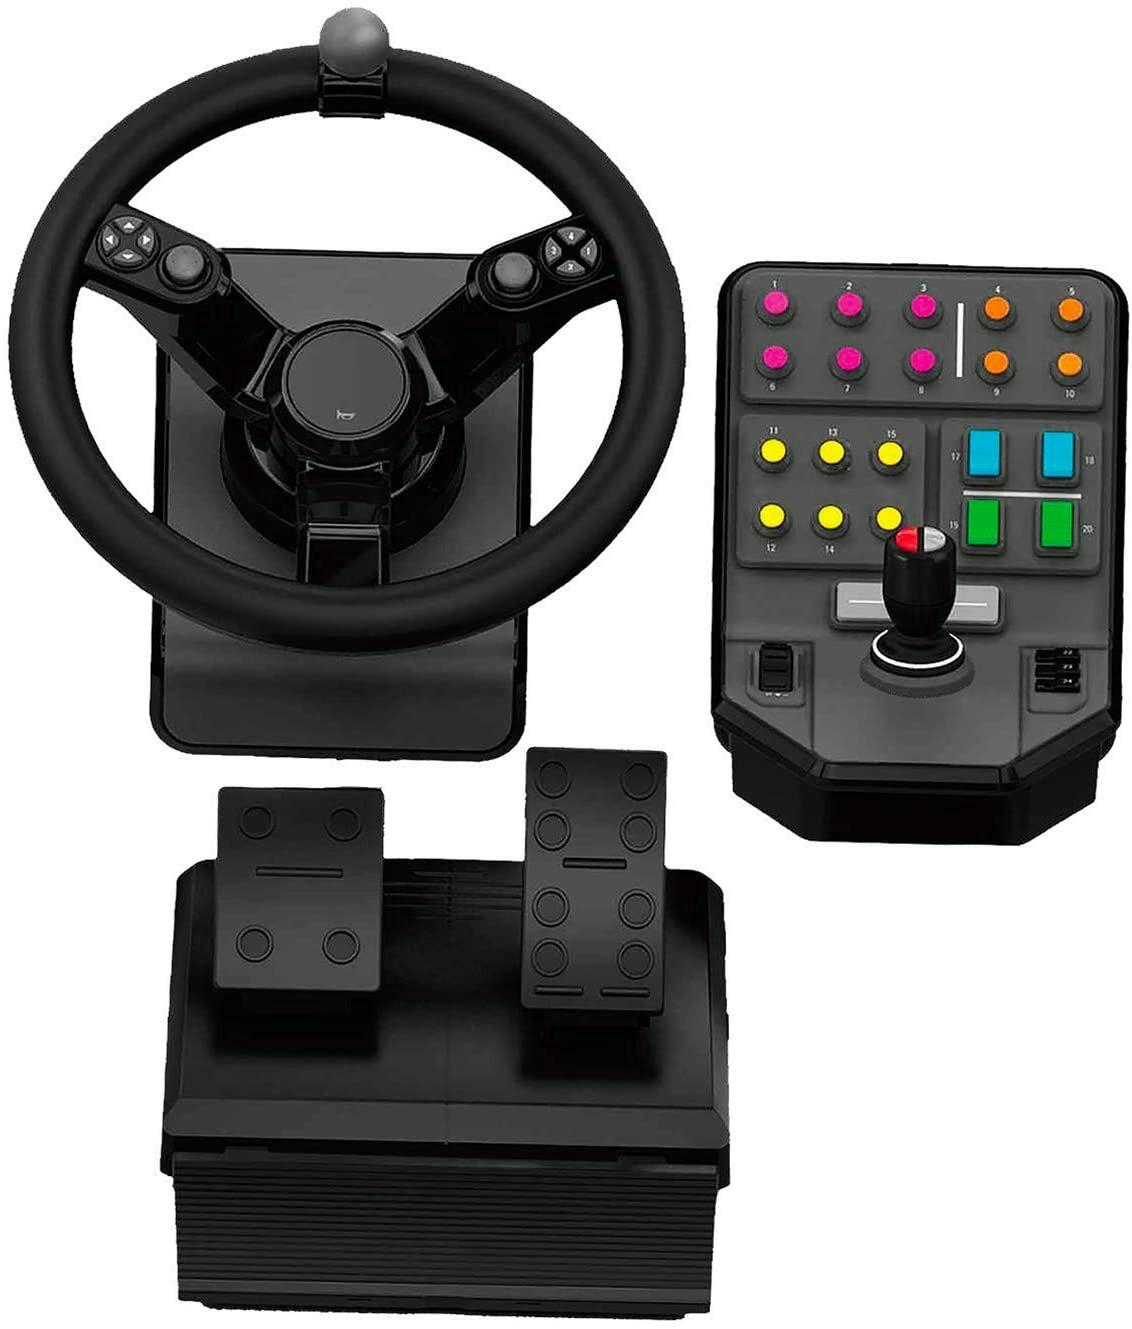 Pack Logitech G Saitek Farming Simulator Controller